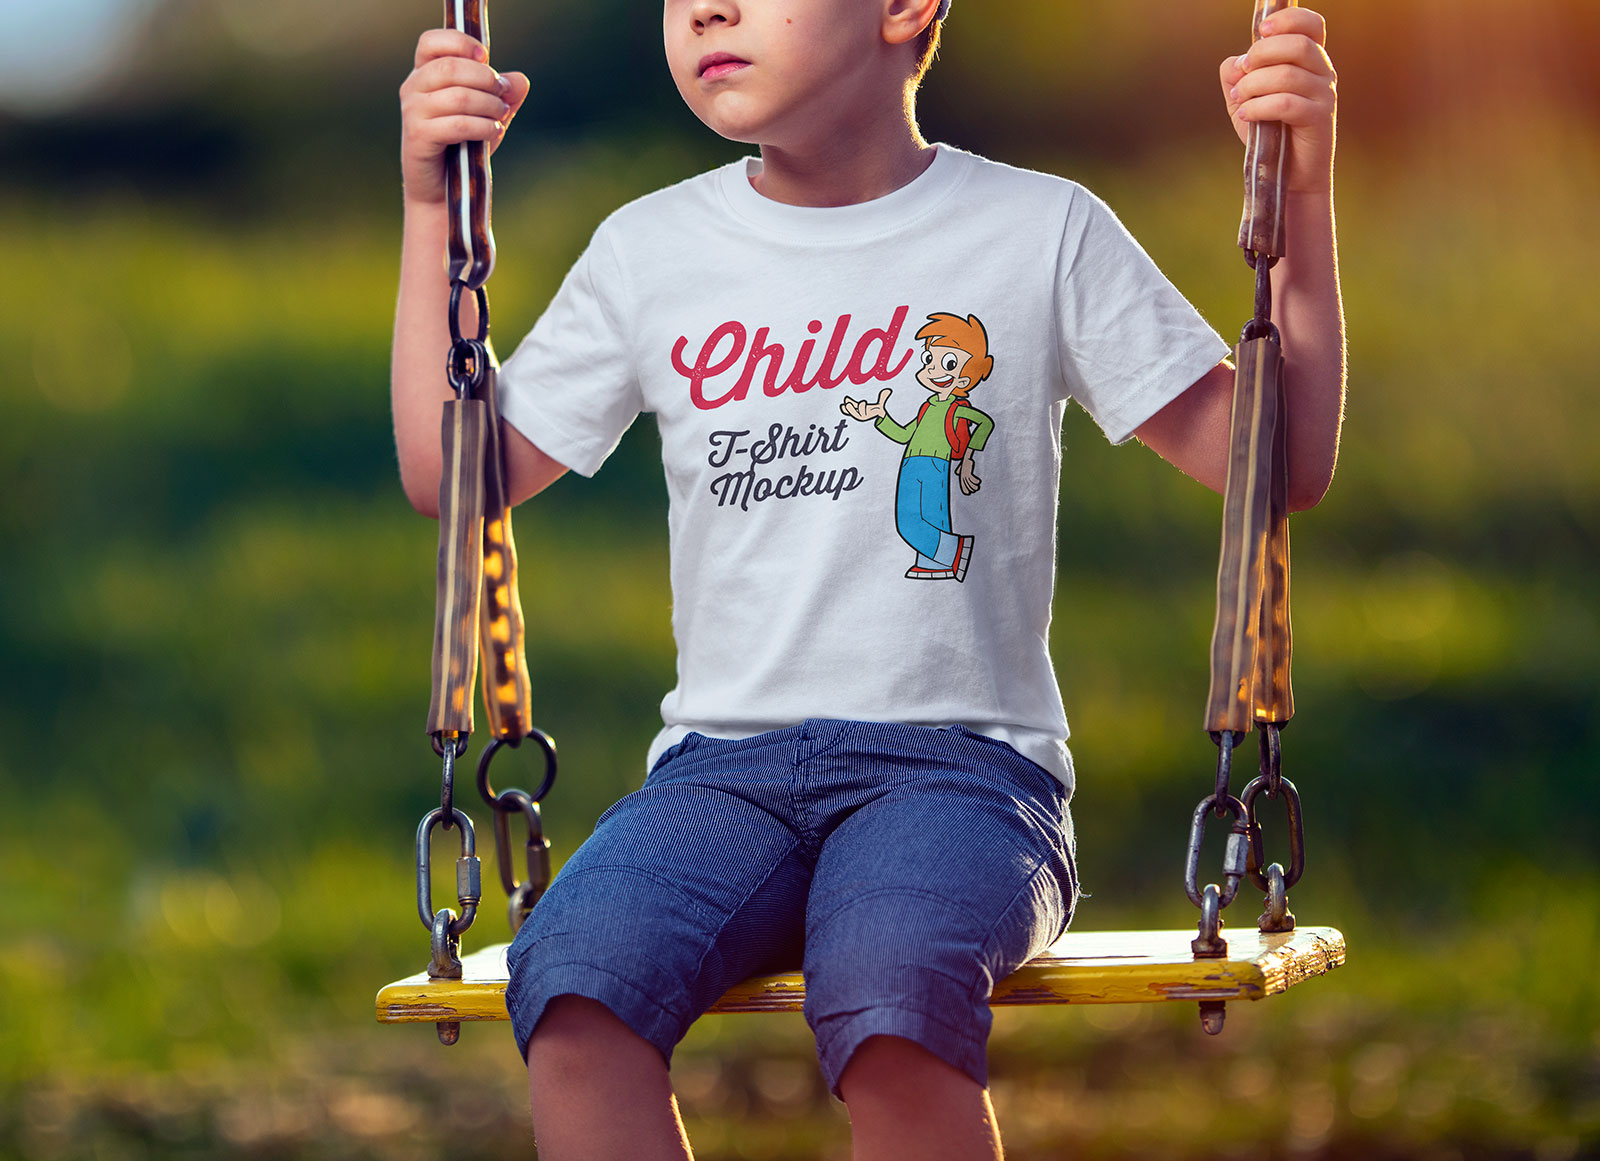 Free-Short-Sleeves-Child-T-Shirt-Mockup-PSD